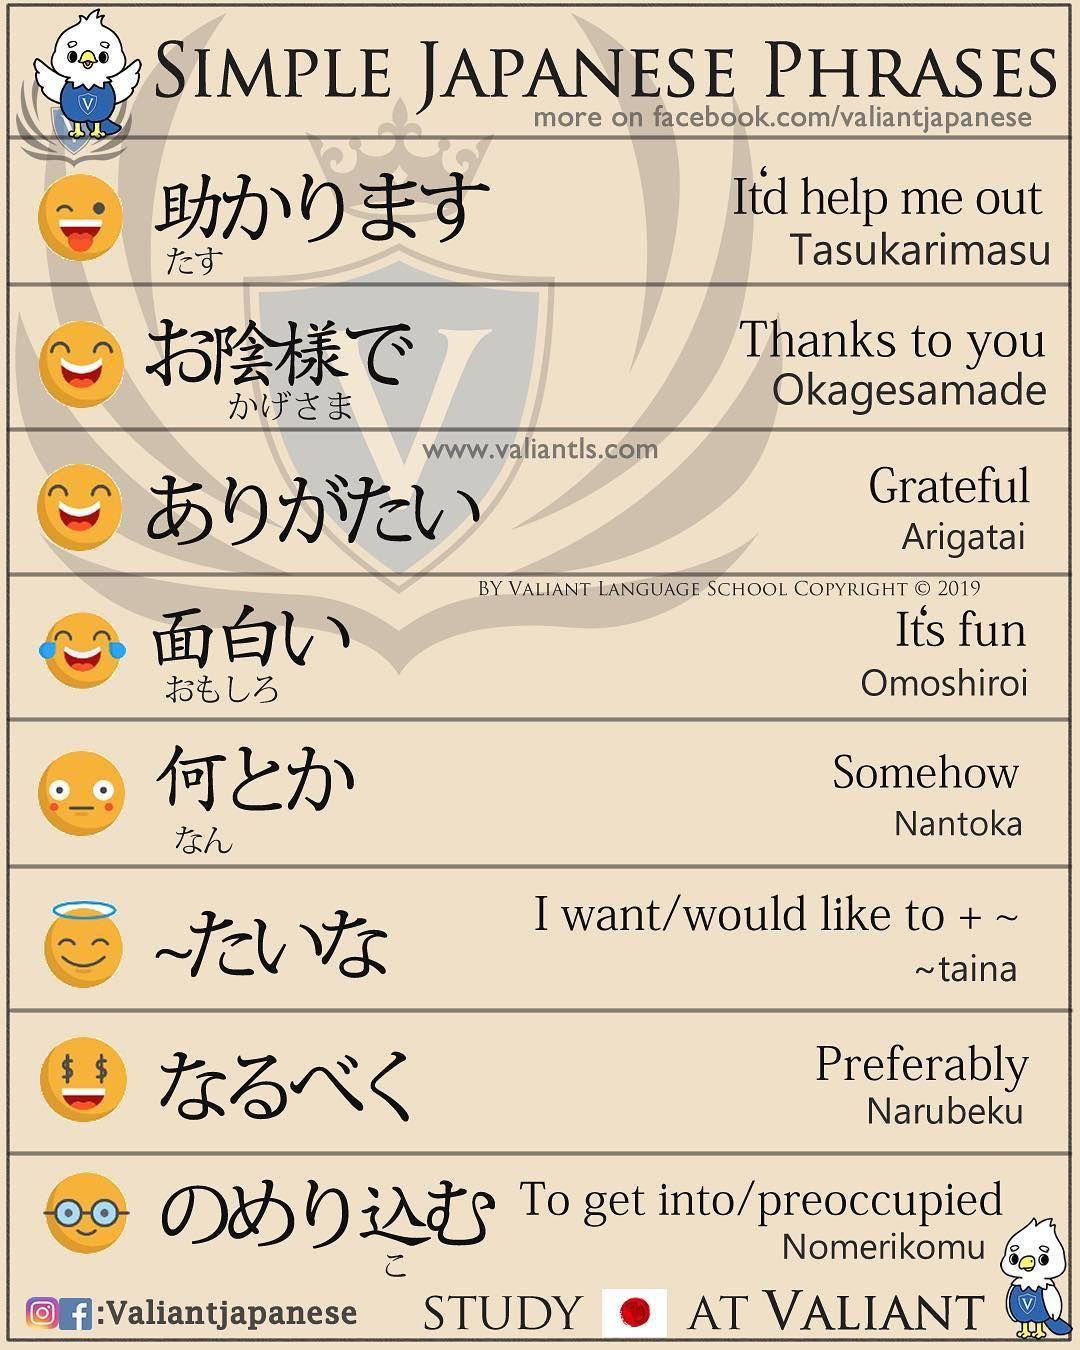 Simple Japanese Phrases Japanese Phrases Learn Basic Japanese Japanese Words